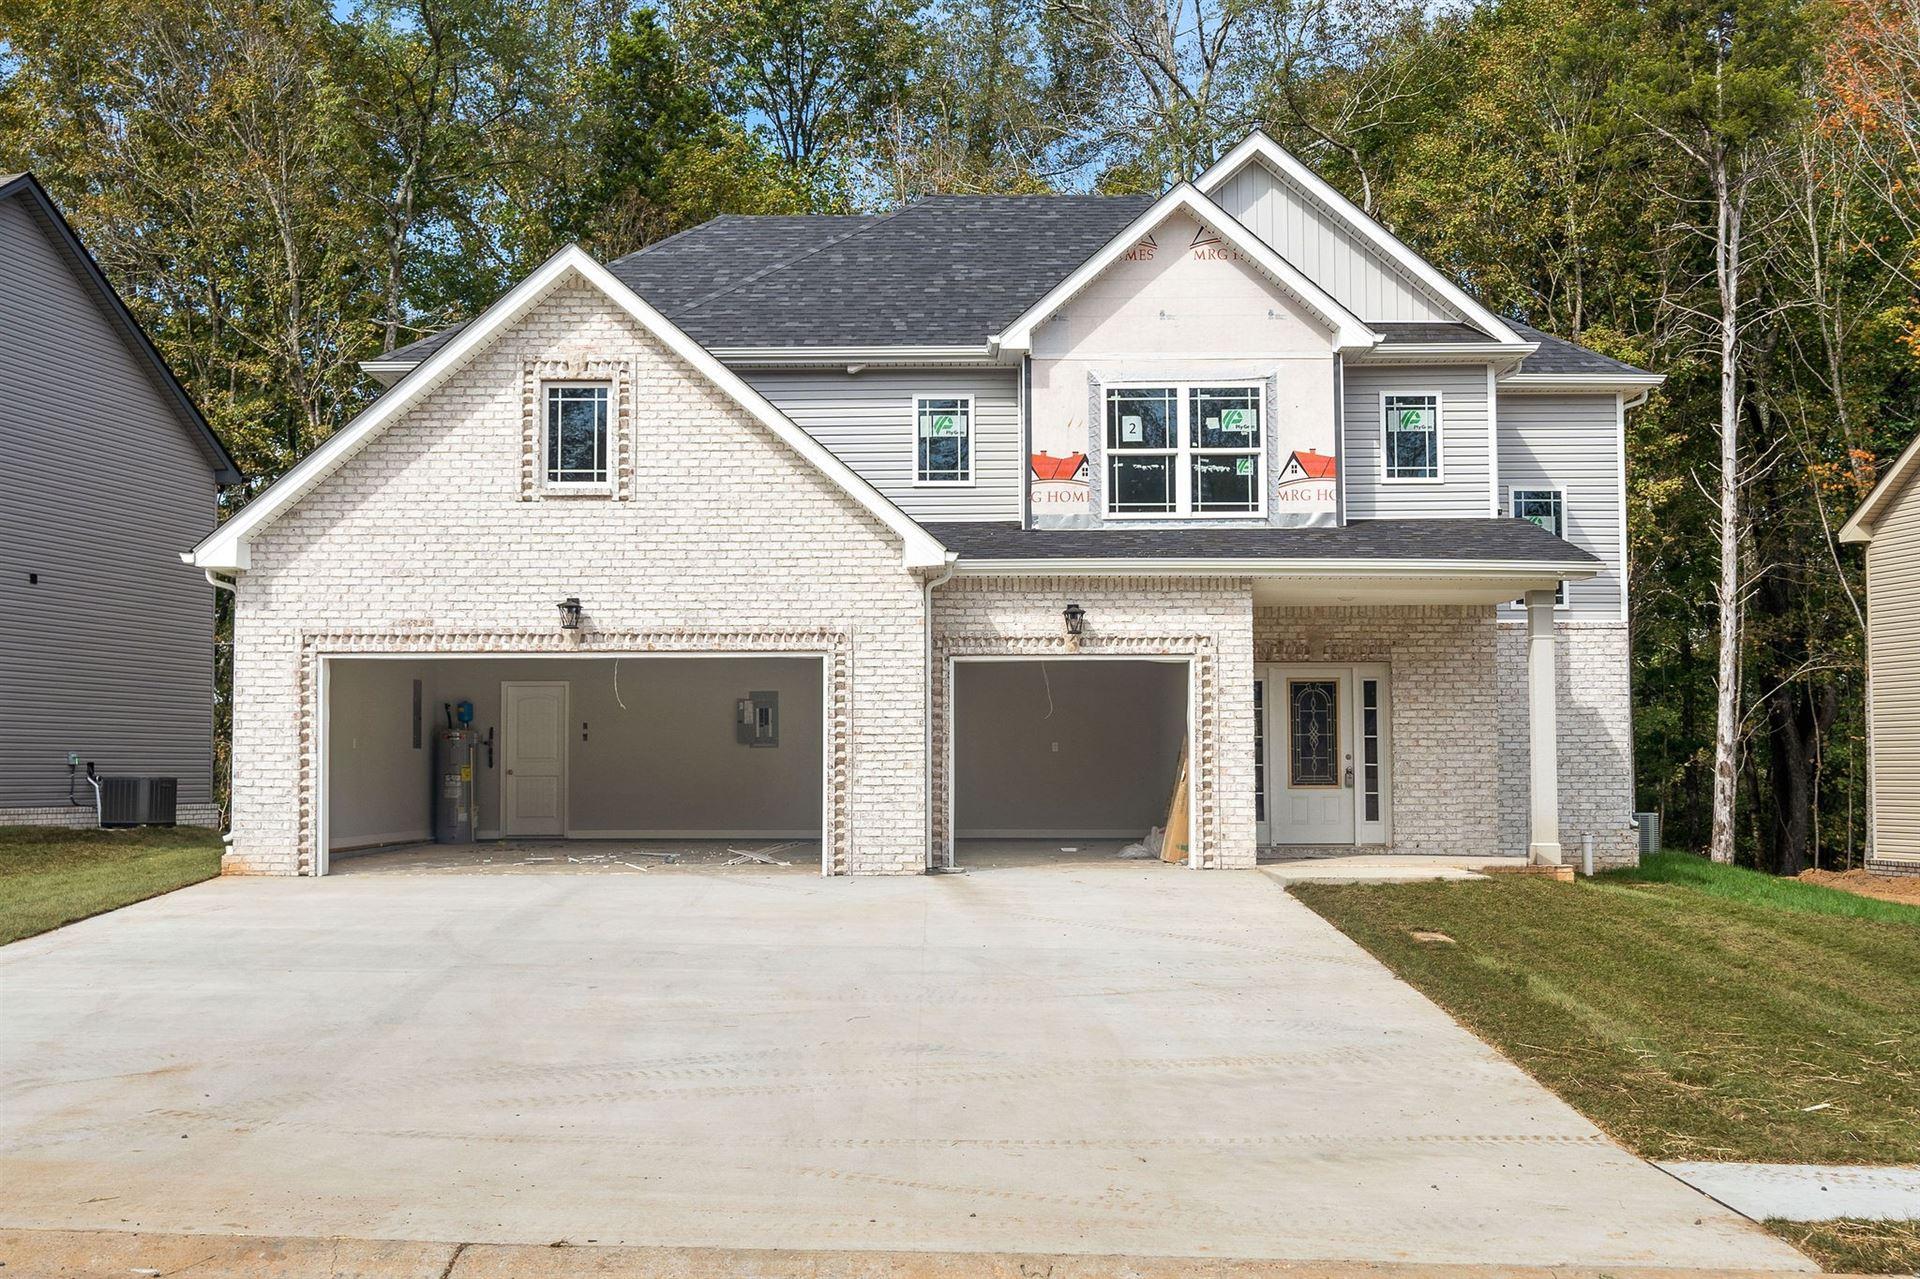 2 Glenstone, Clarksville, TN 37043 - MLS#: 2288938